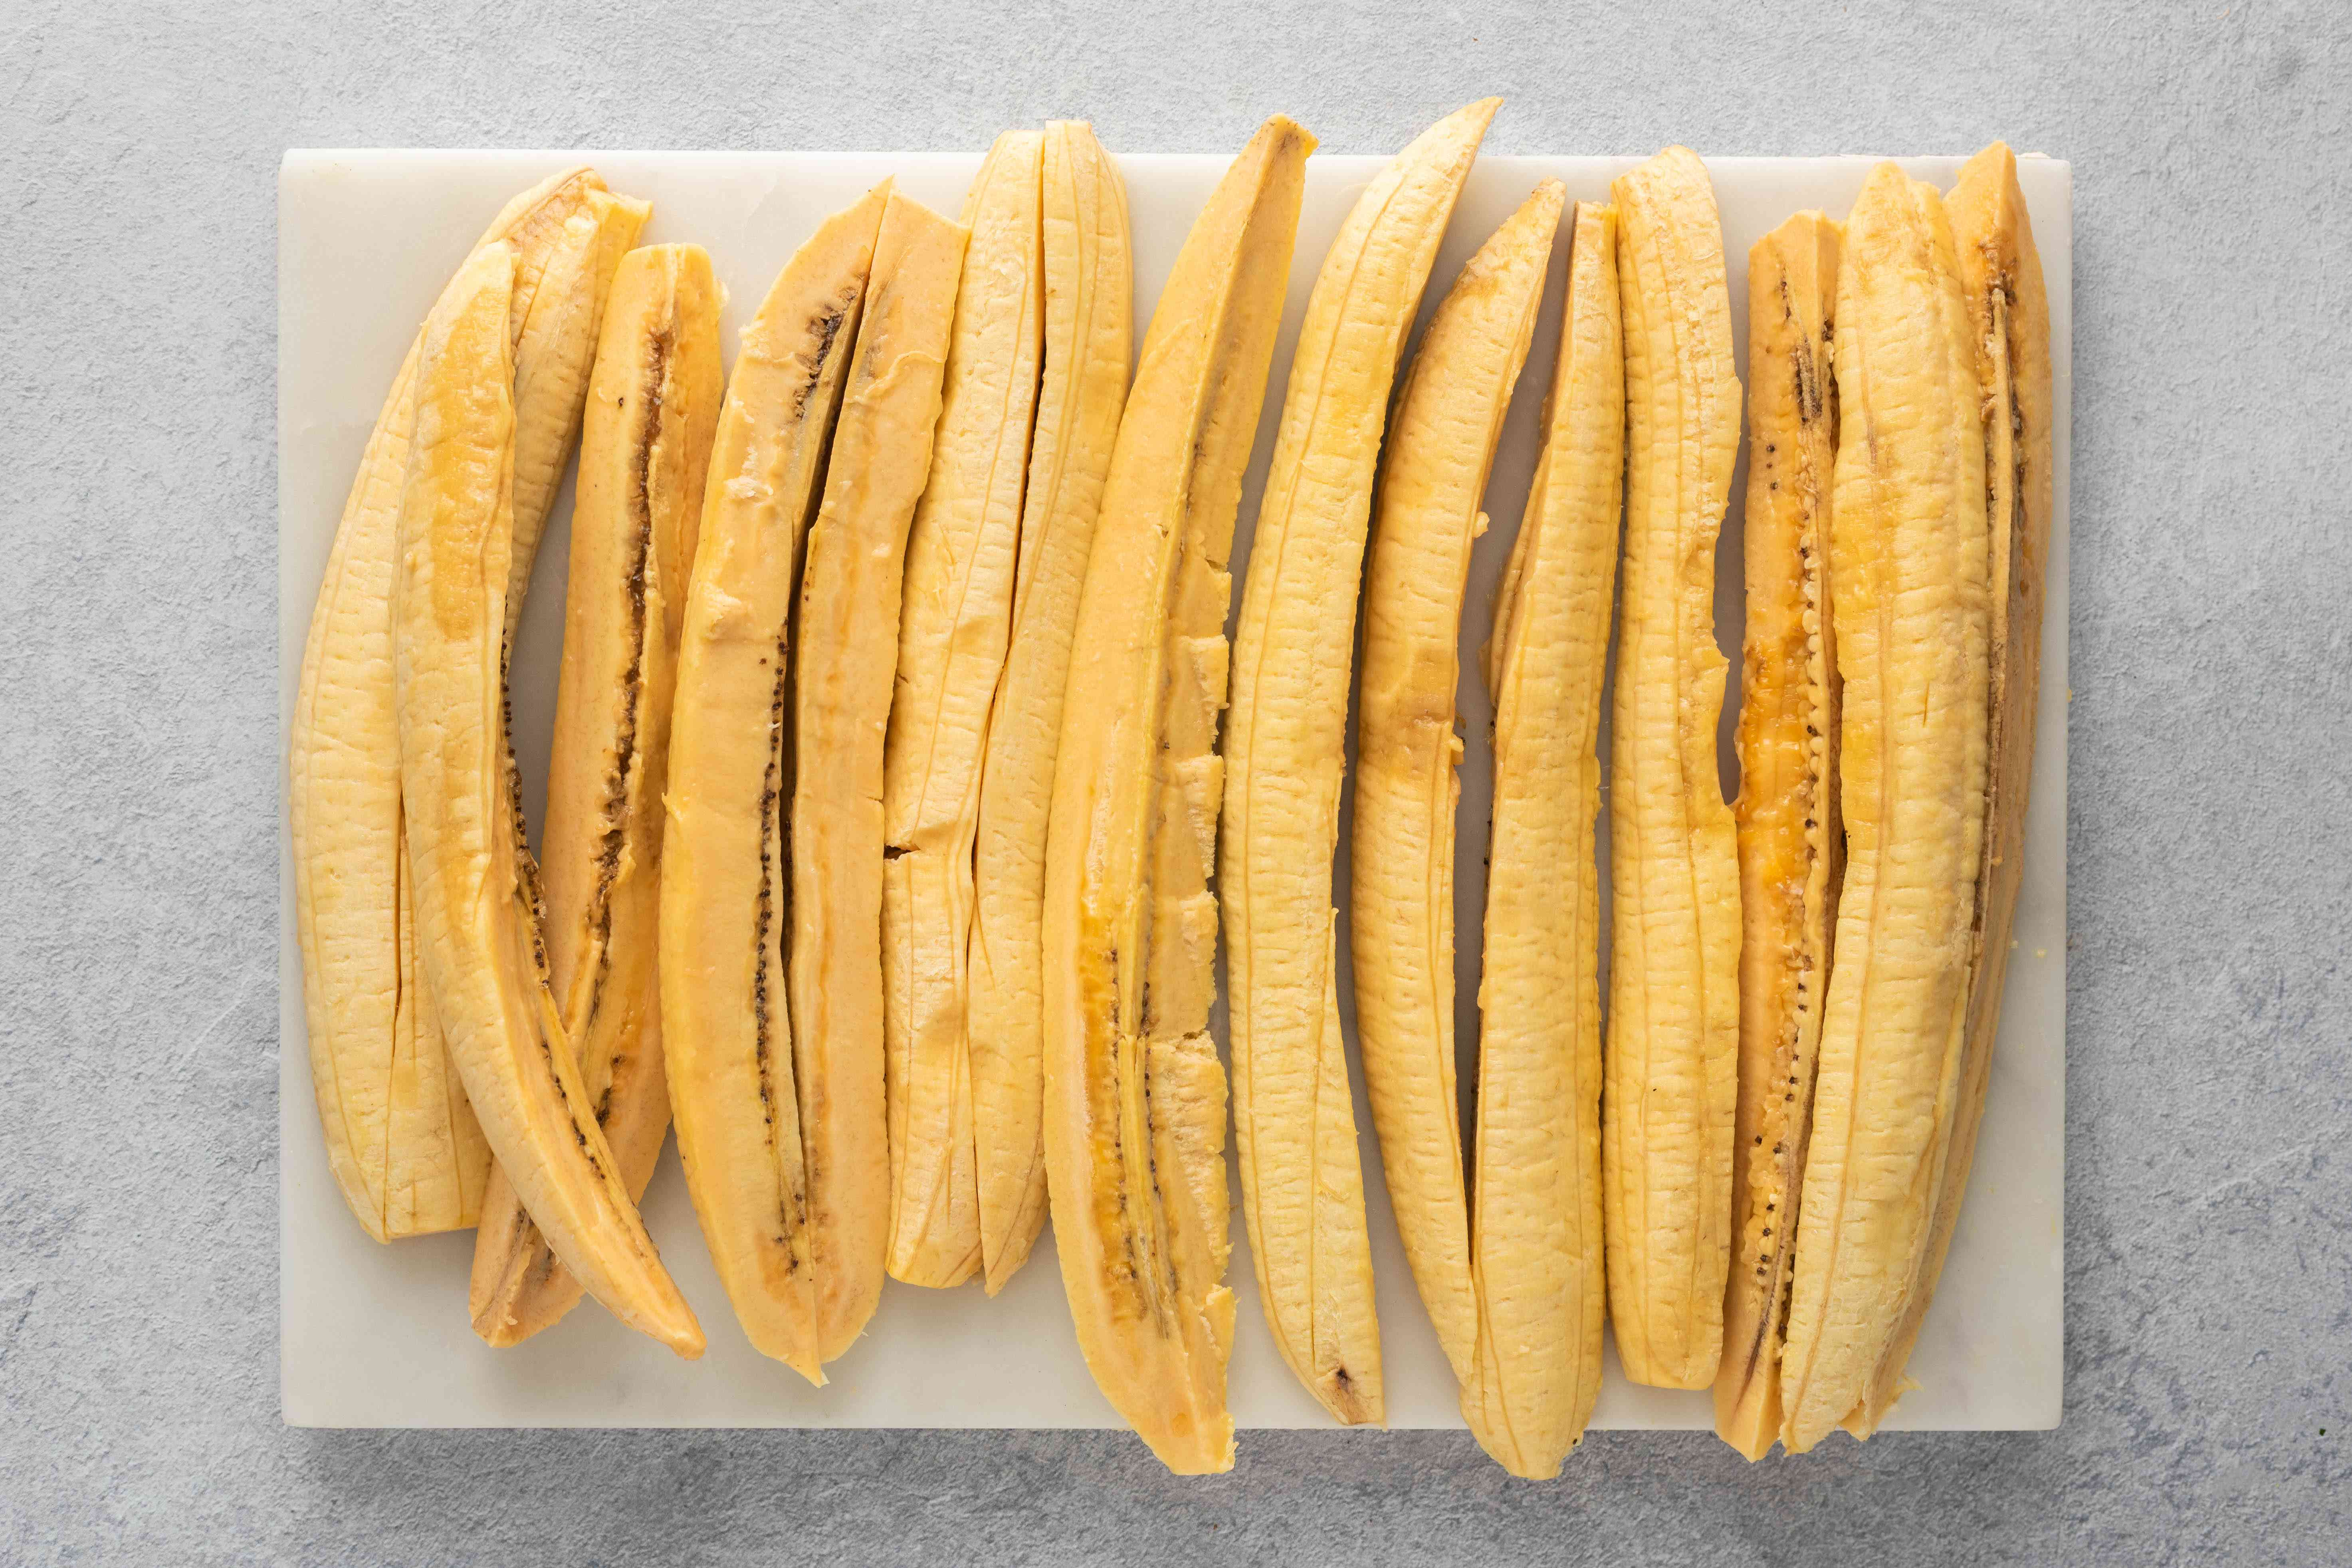 slice each plantain into four long pieces